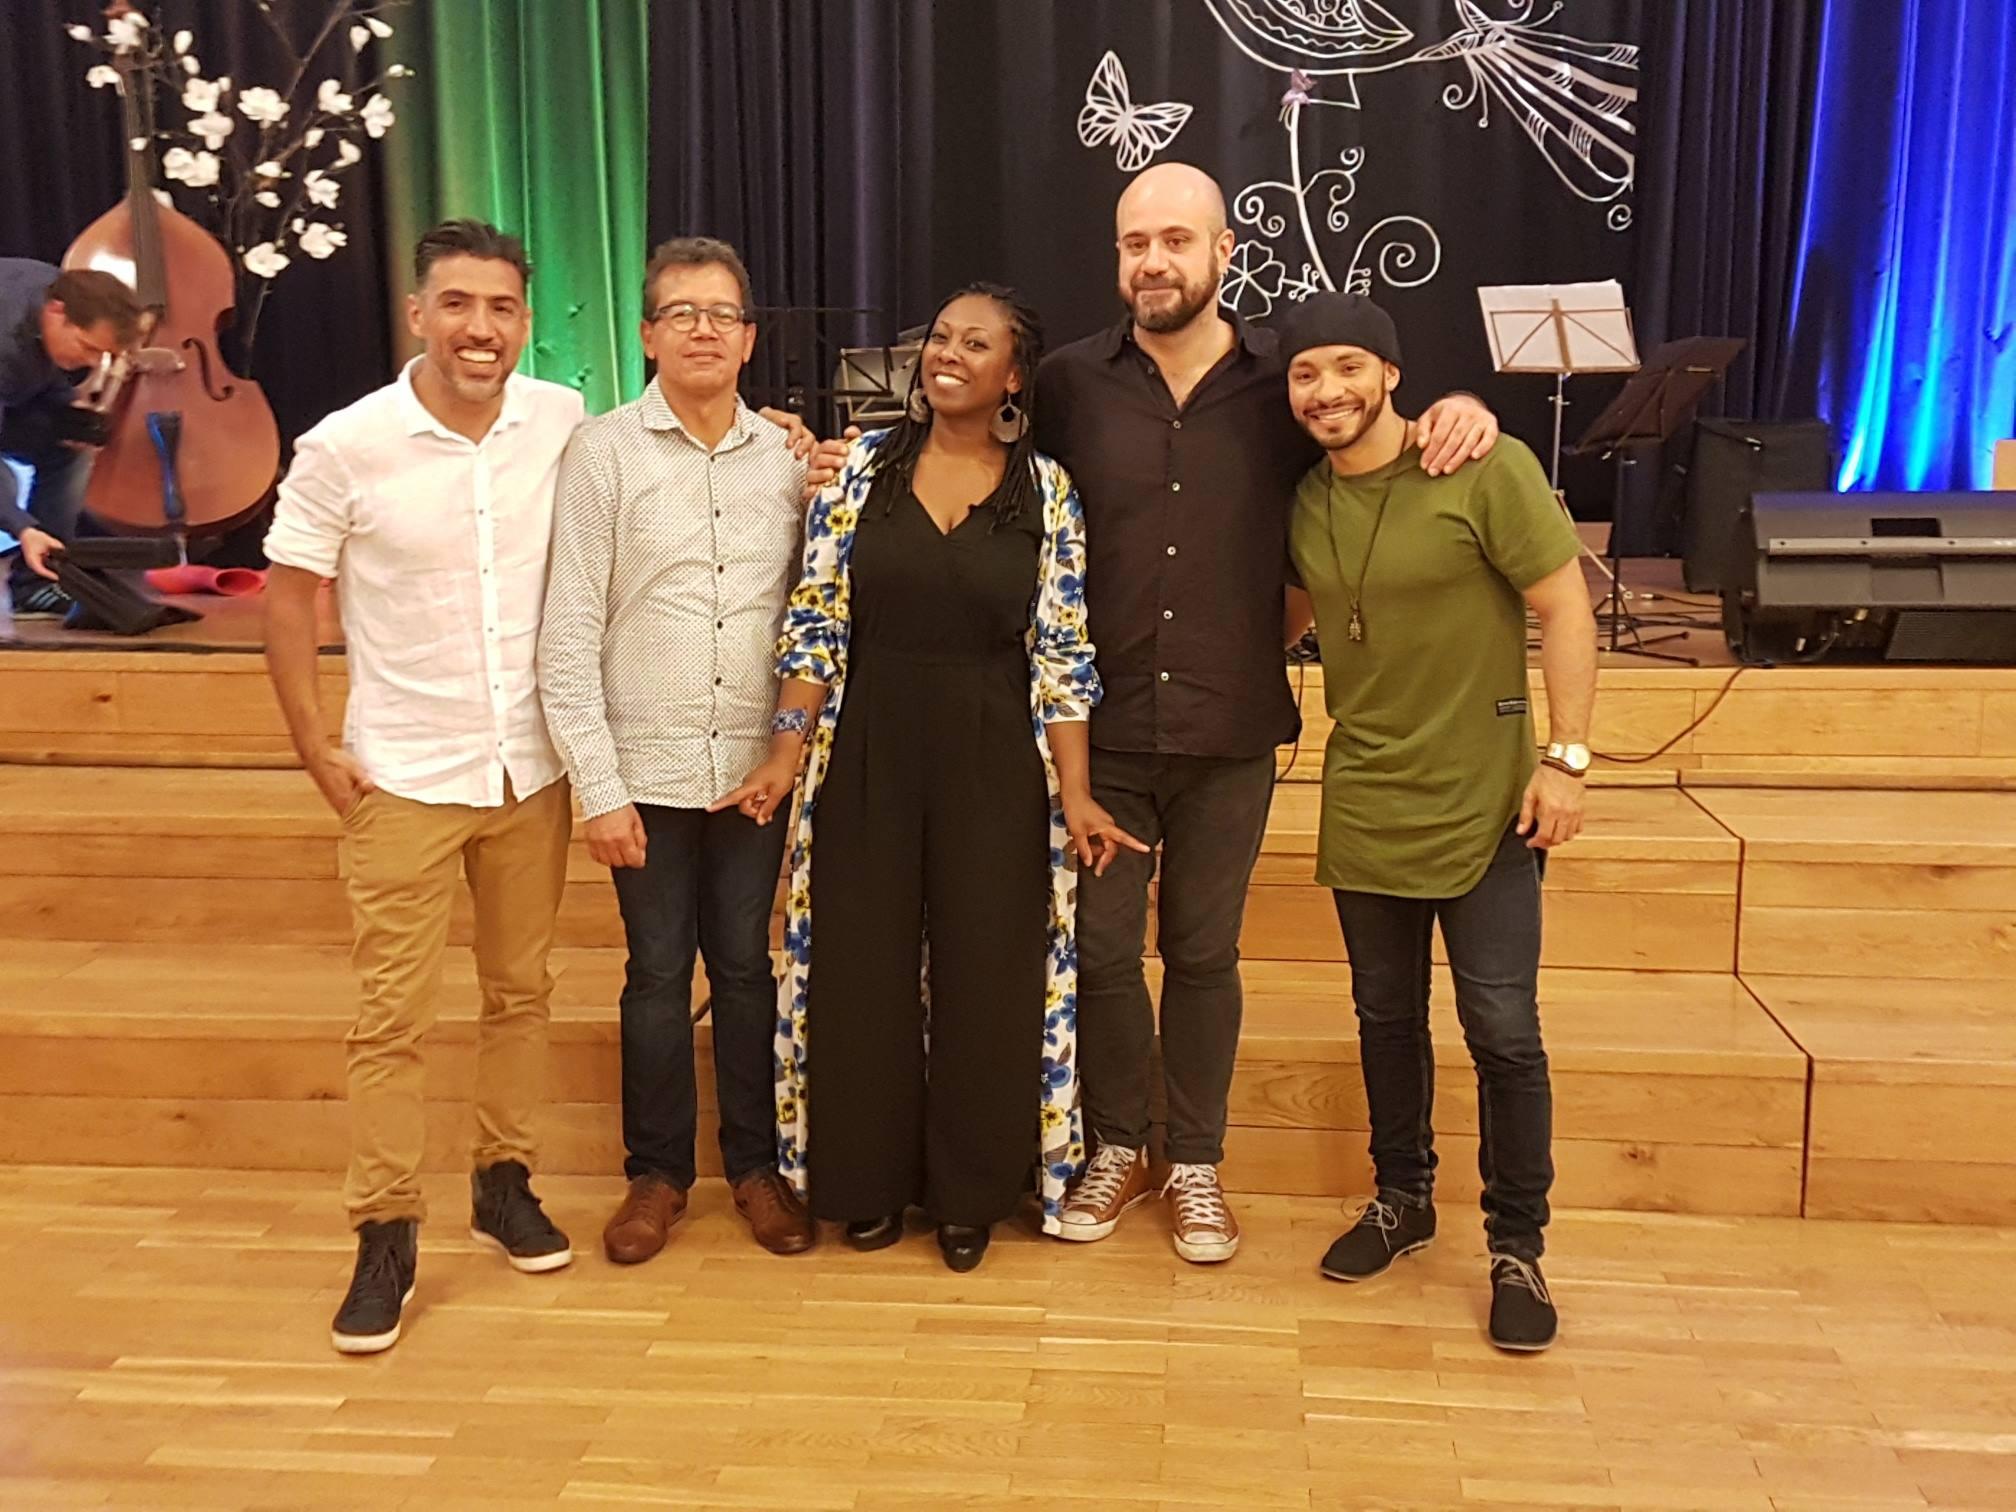 Chorinho night @ Saku Huvikeskus - Duo Obi and guests: Dorian Mori, Guto Lucena and Rodrigo Manfrina